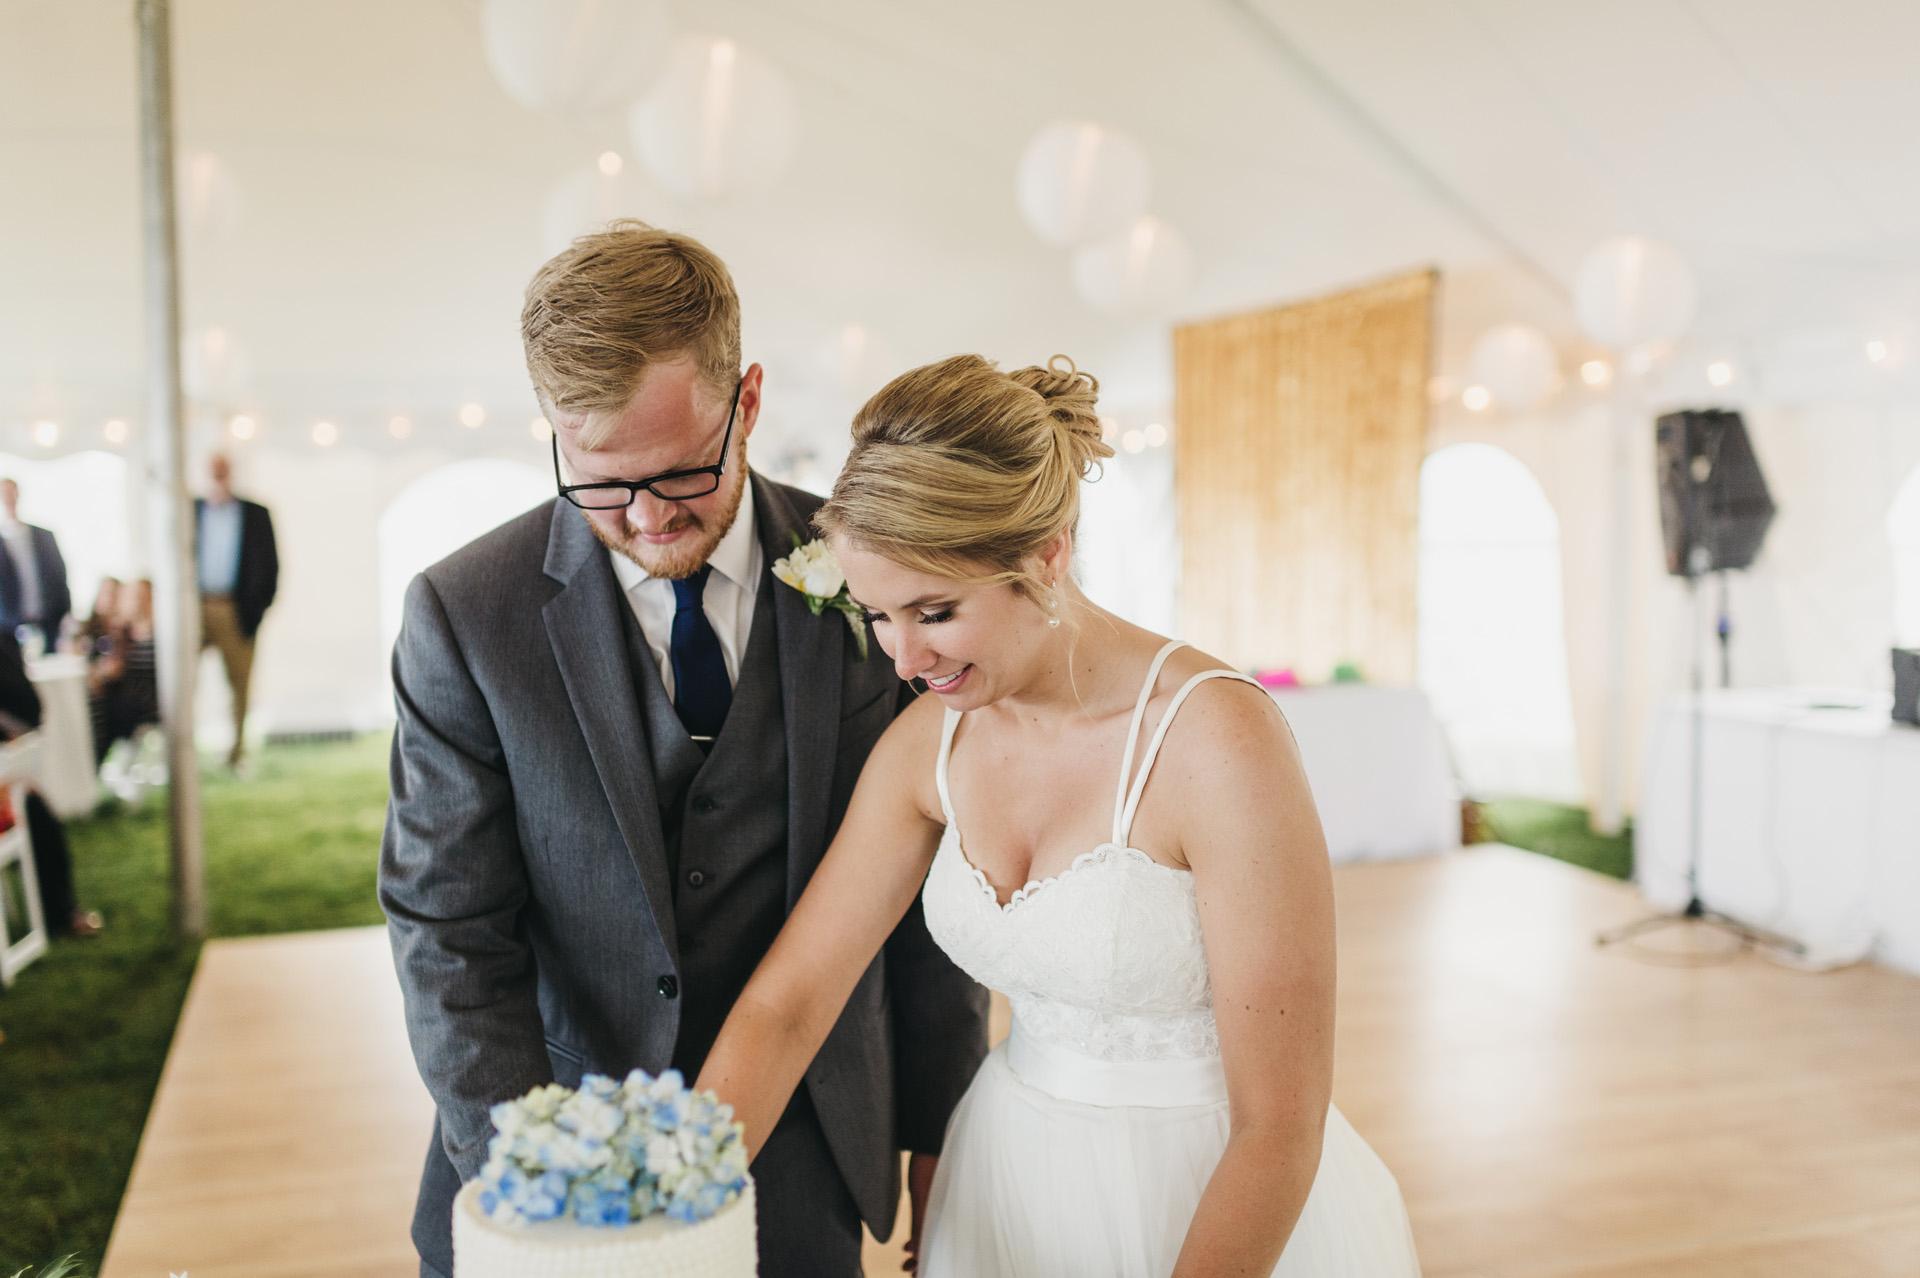 winslow-estate-wedding-59